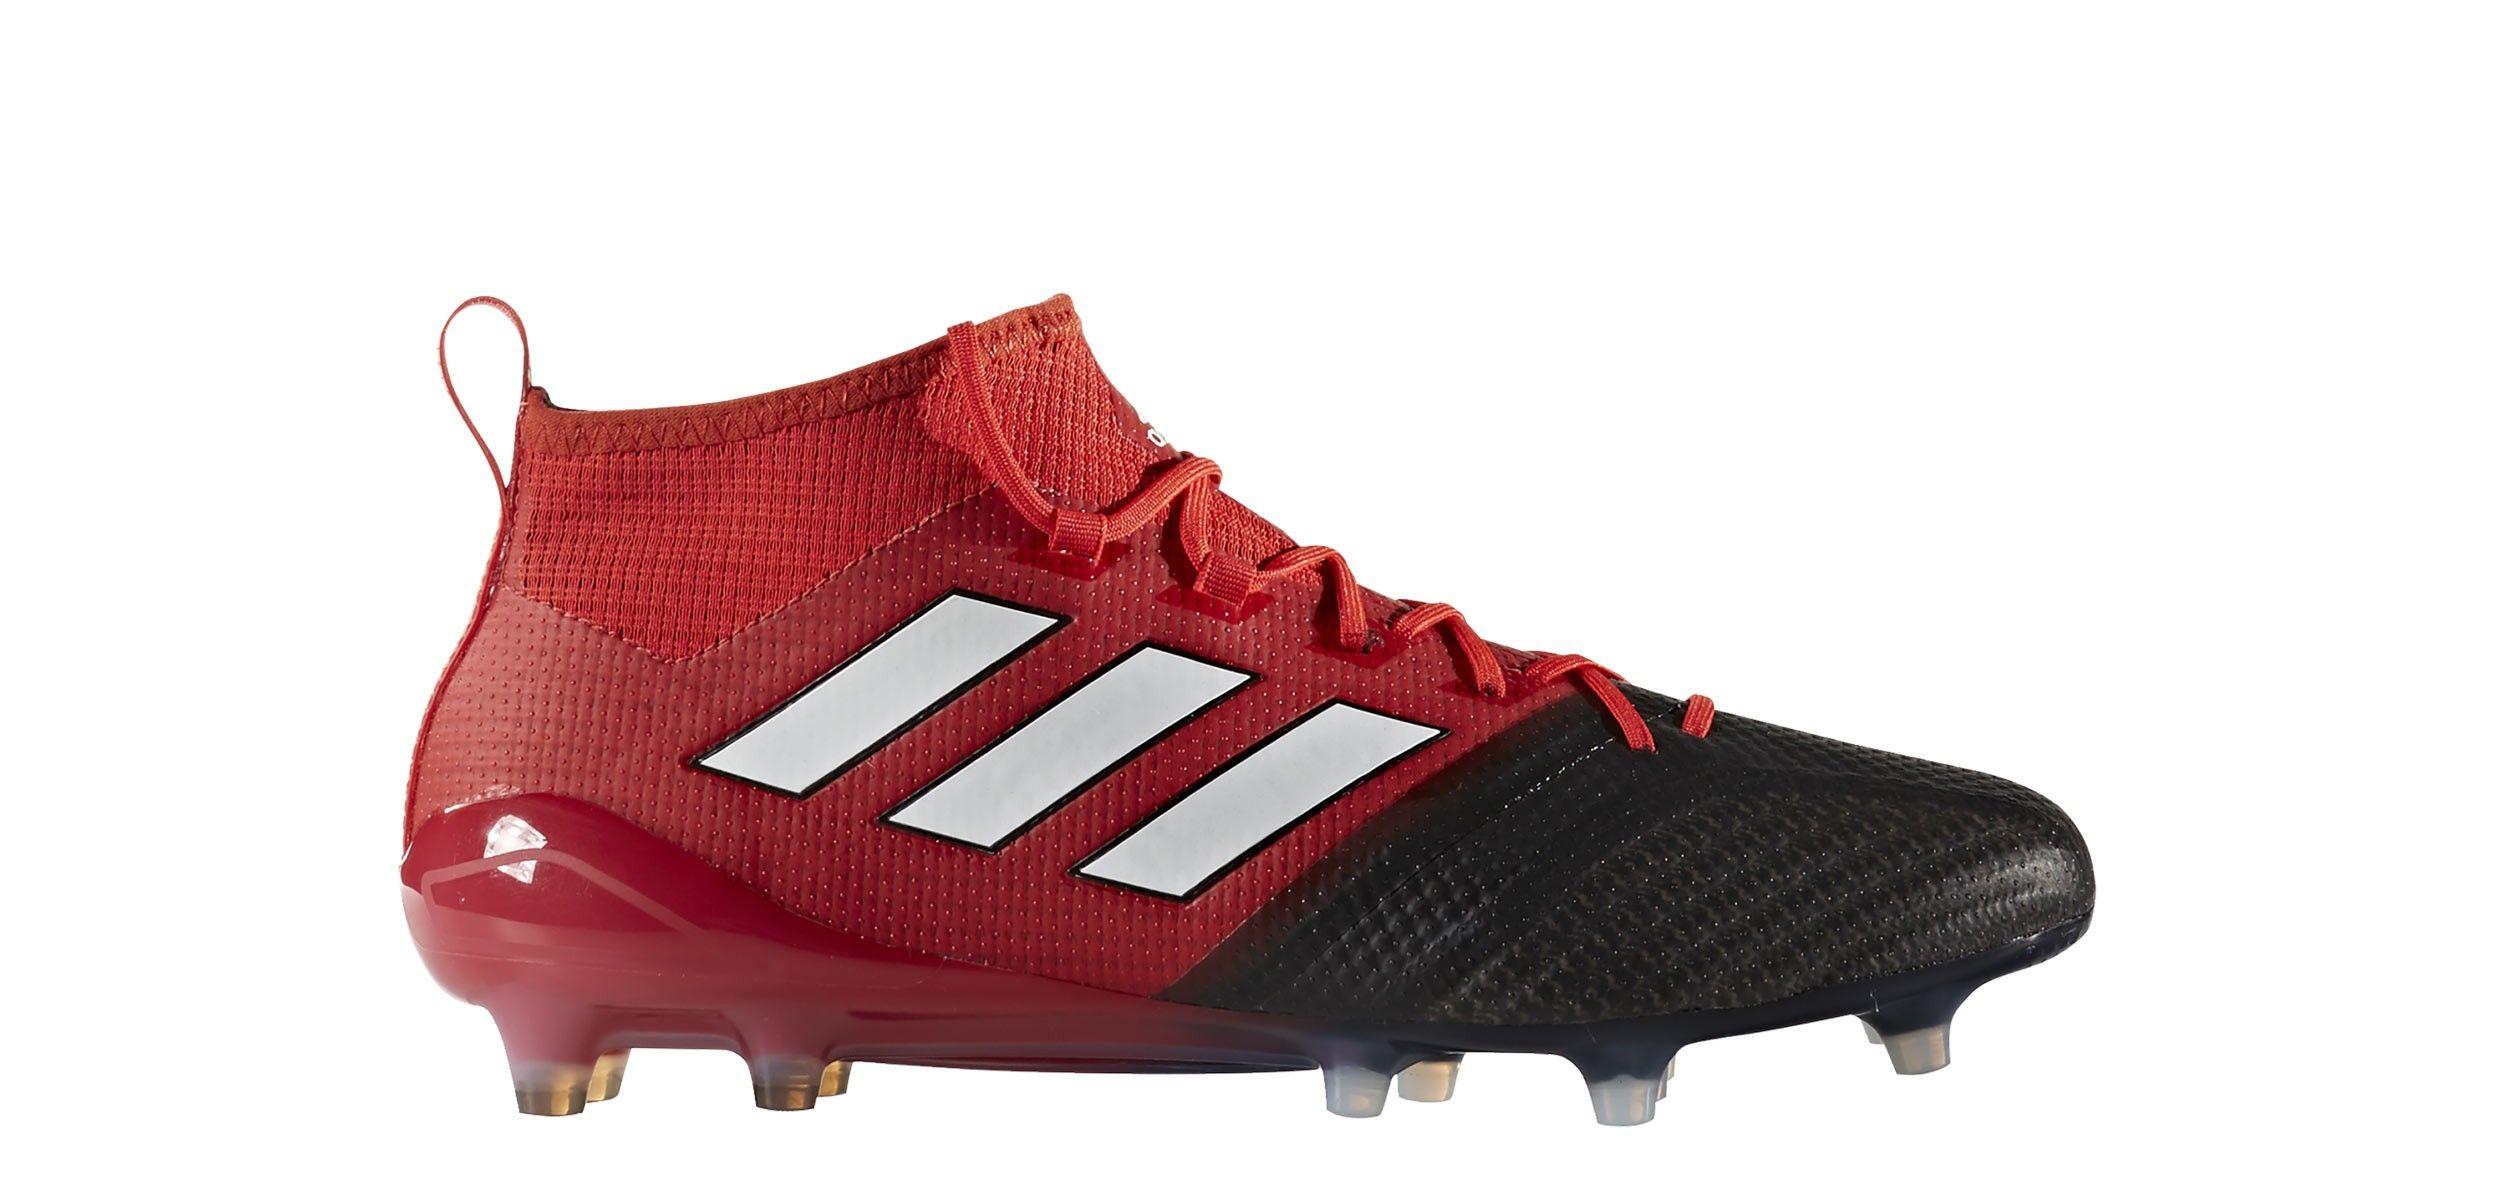 finest selection ff9d4 09409 Botas de fútbol adidas ACE 17.1 Primeknit FG - Rojo   Negro - exterior pie  derecho